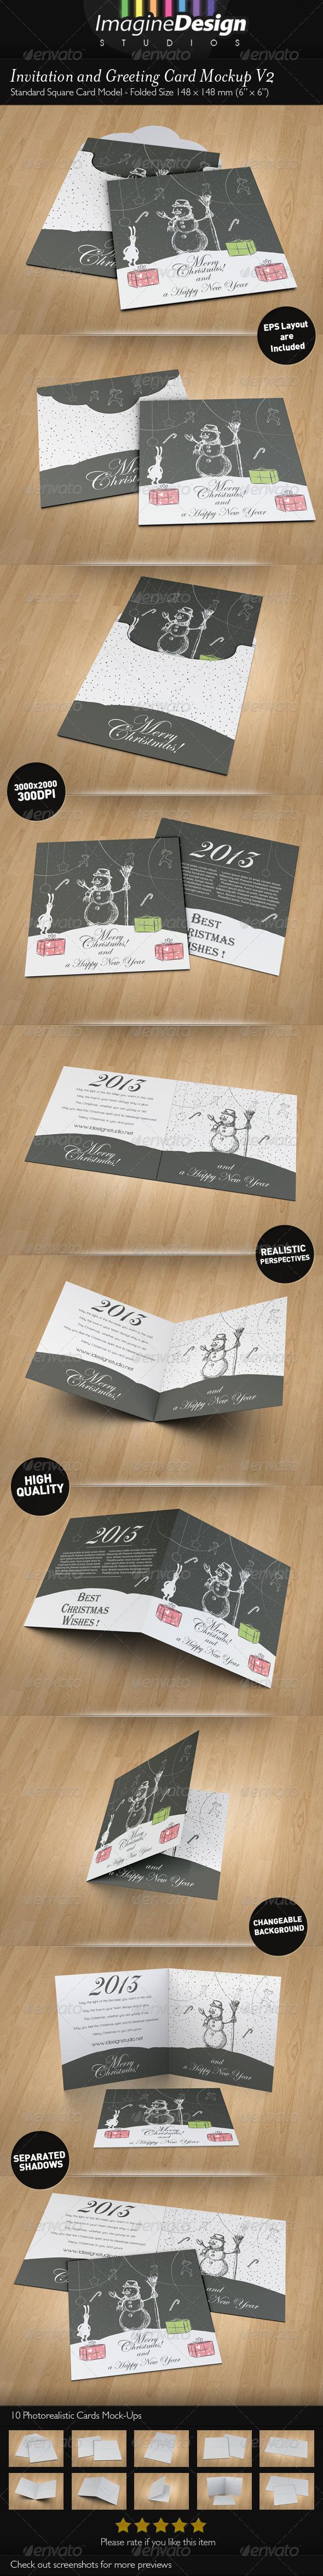 Invitation and Greeting Card Mockup V2 - Miscellaneous Print